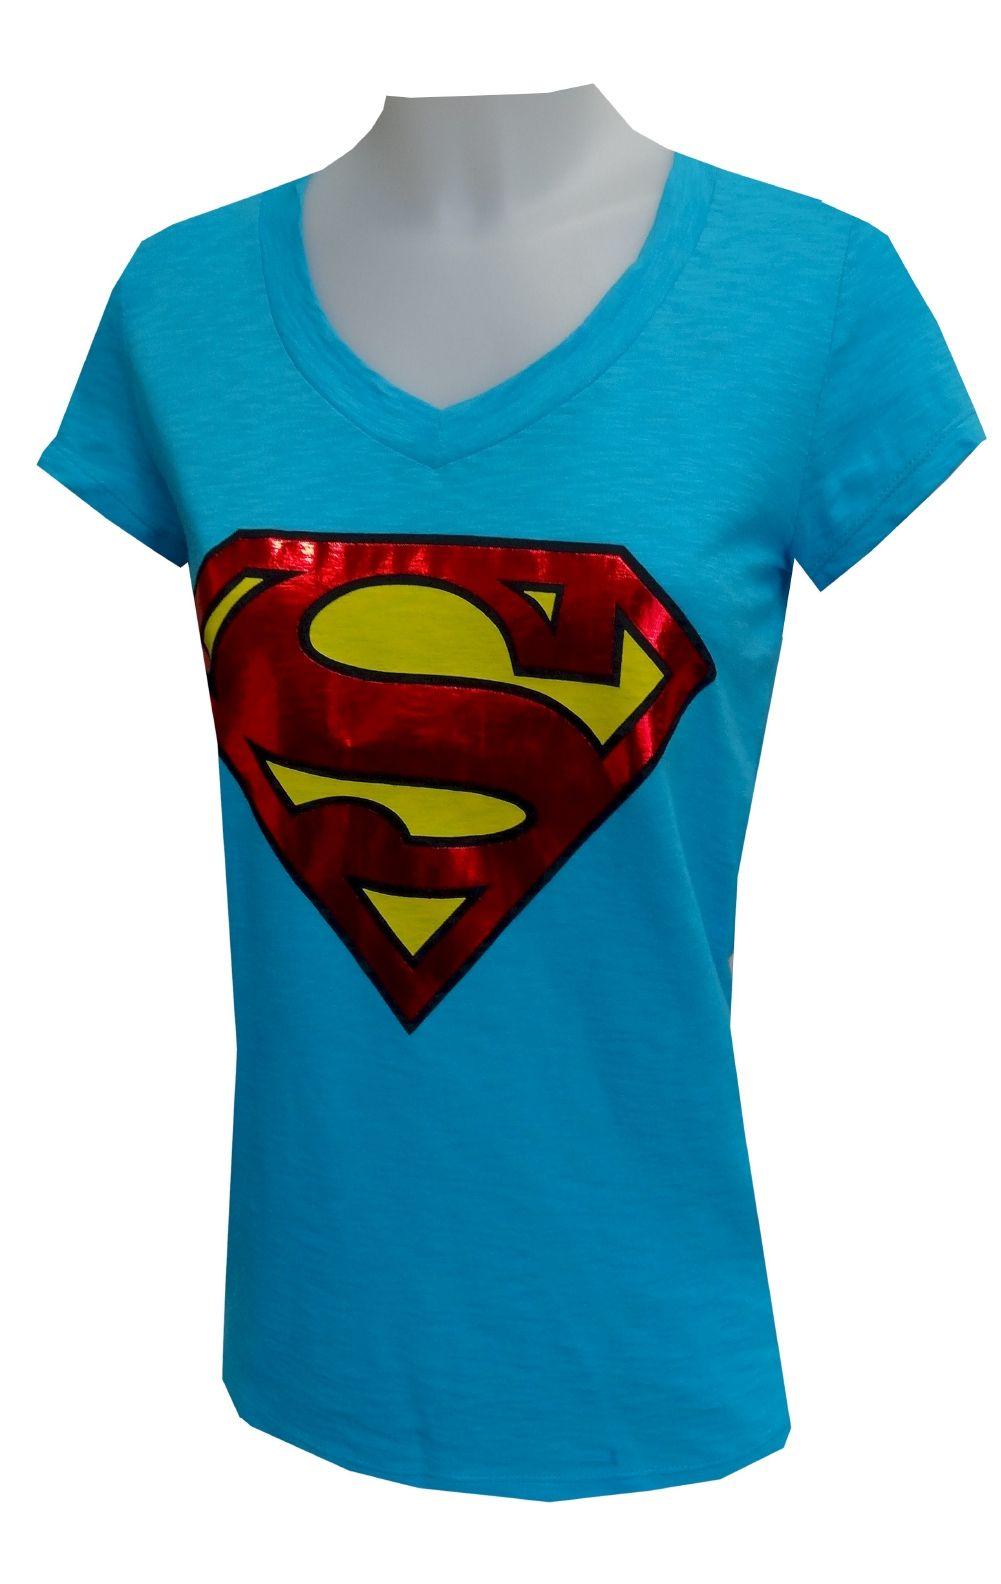 supergirl t-shirt amazon